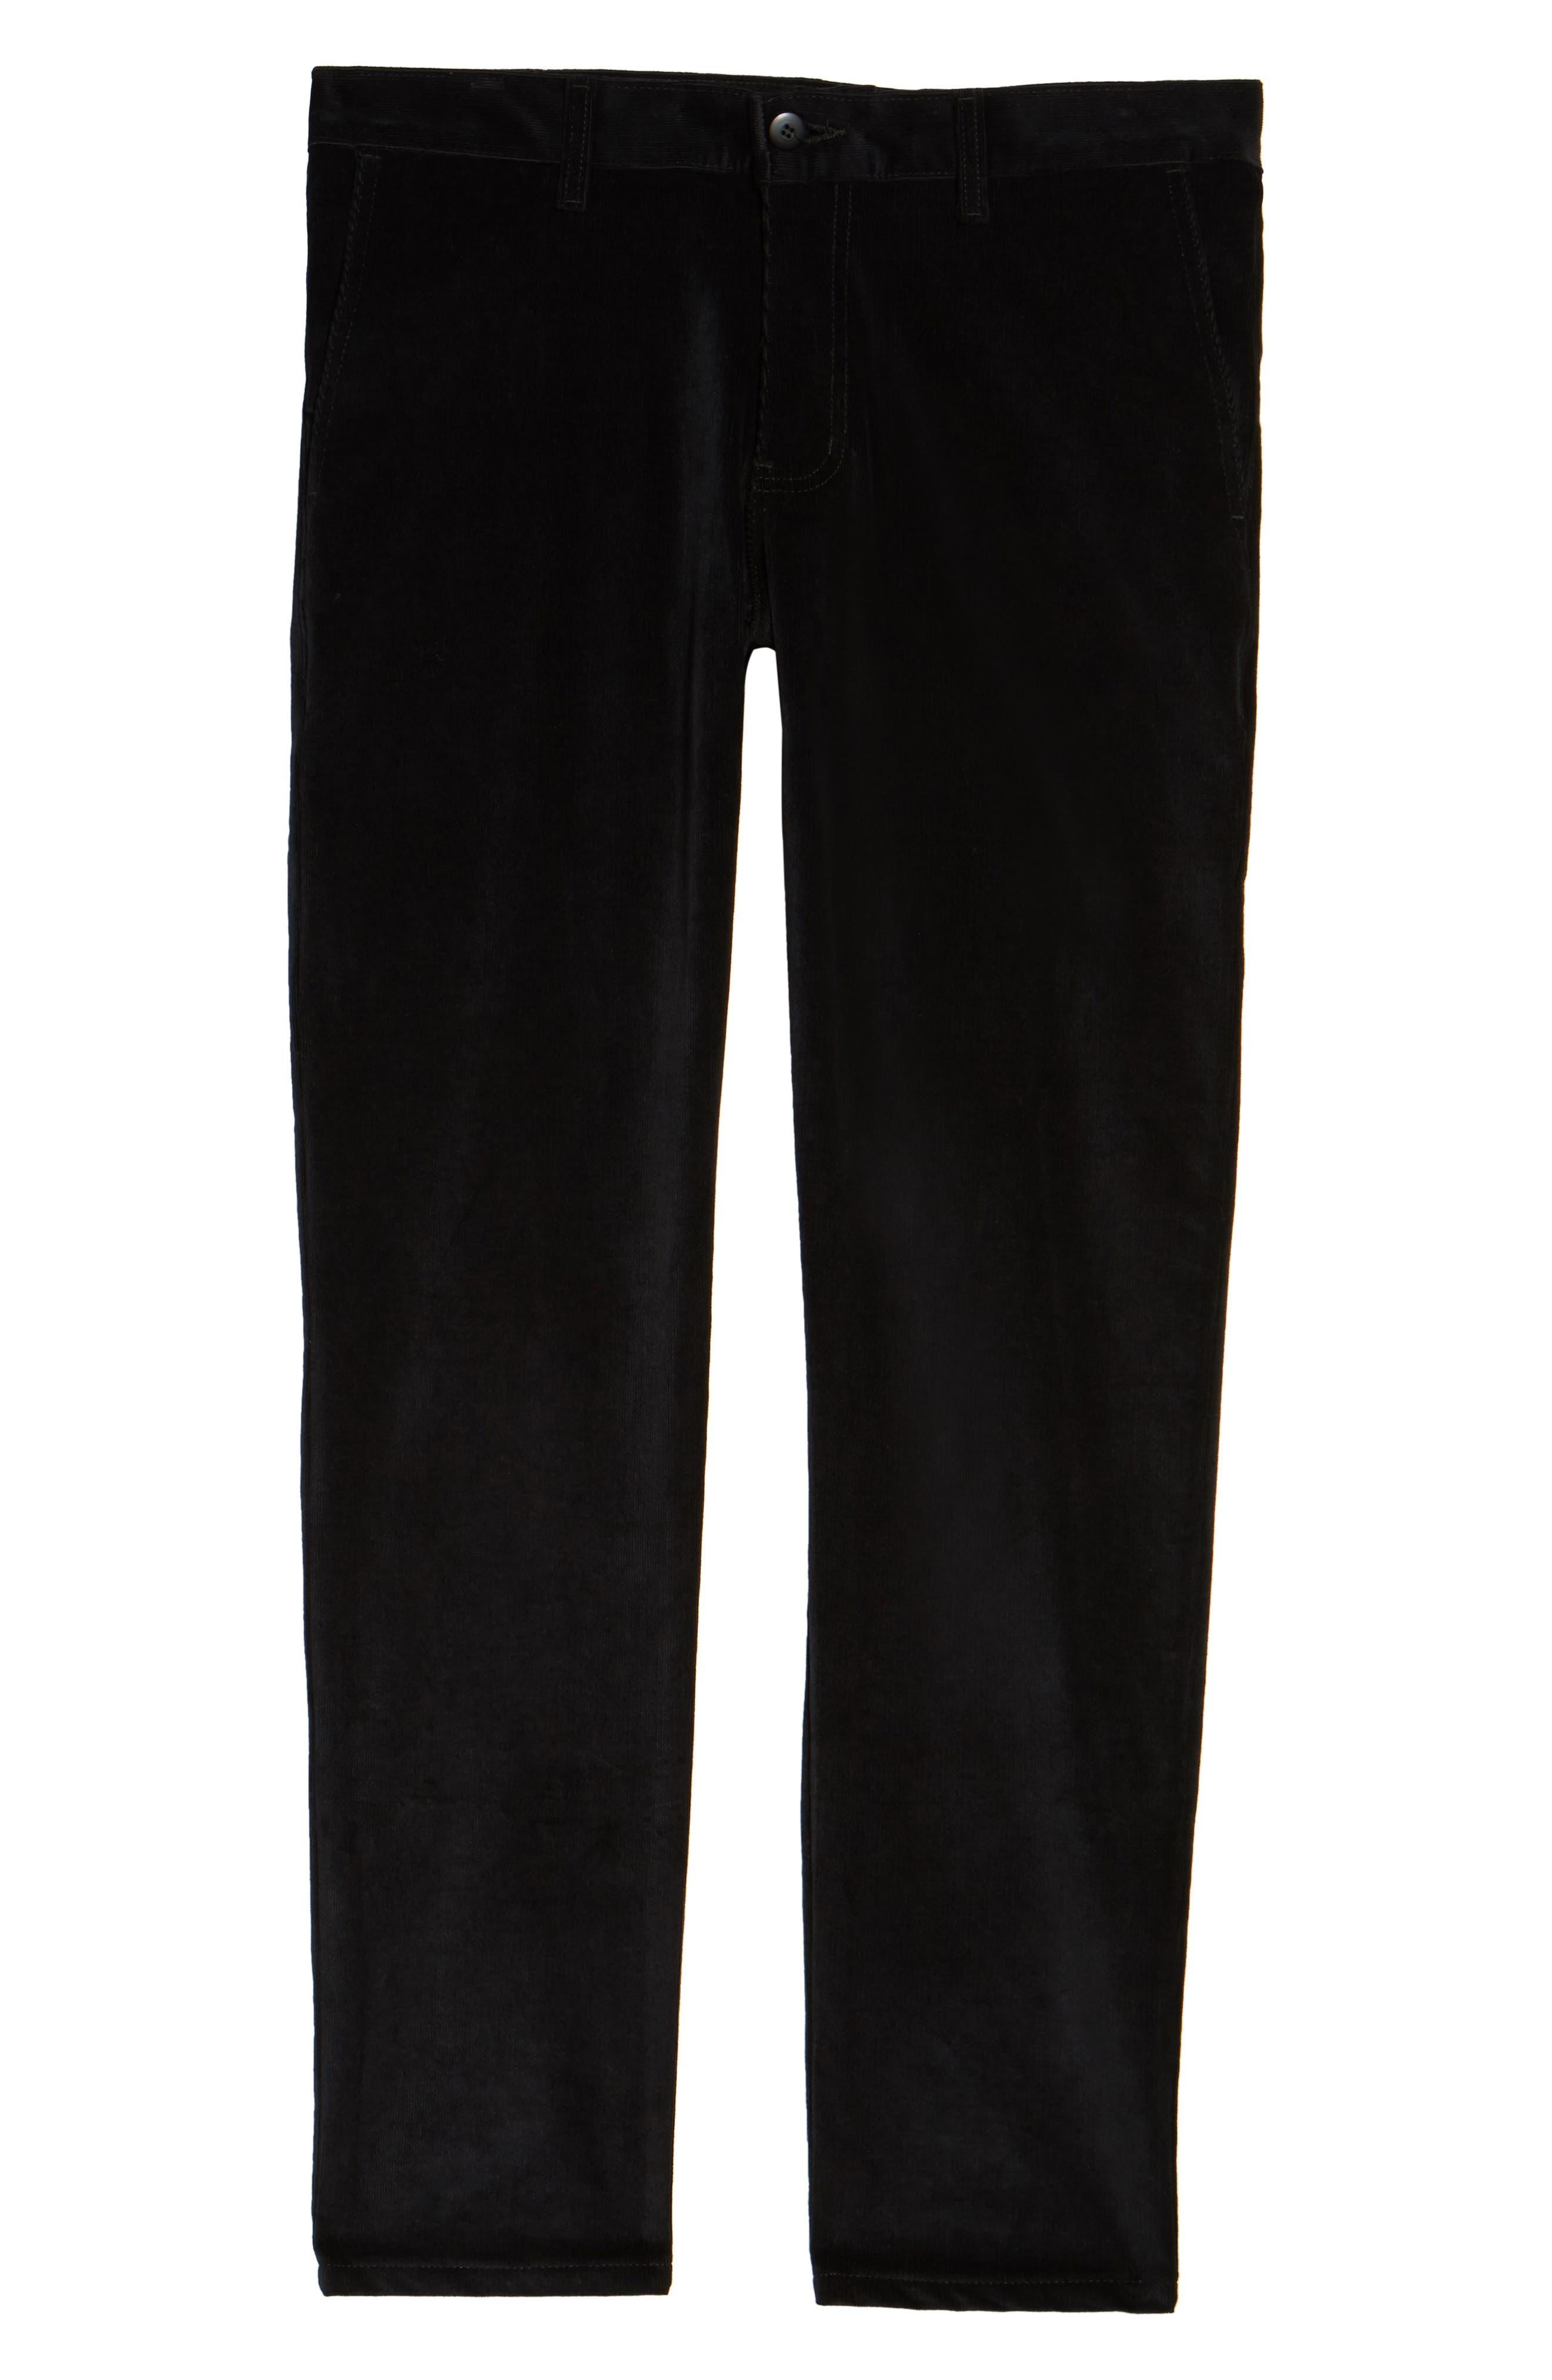 Naked & Famous Slim Chino Slim Fit Corduroy Pants,                             Alternate thumbnail 6, color,                             Black